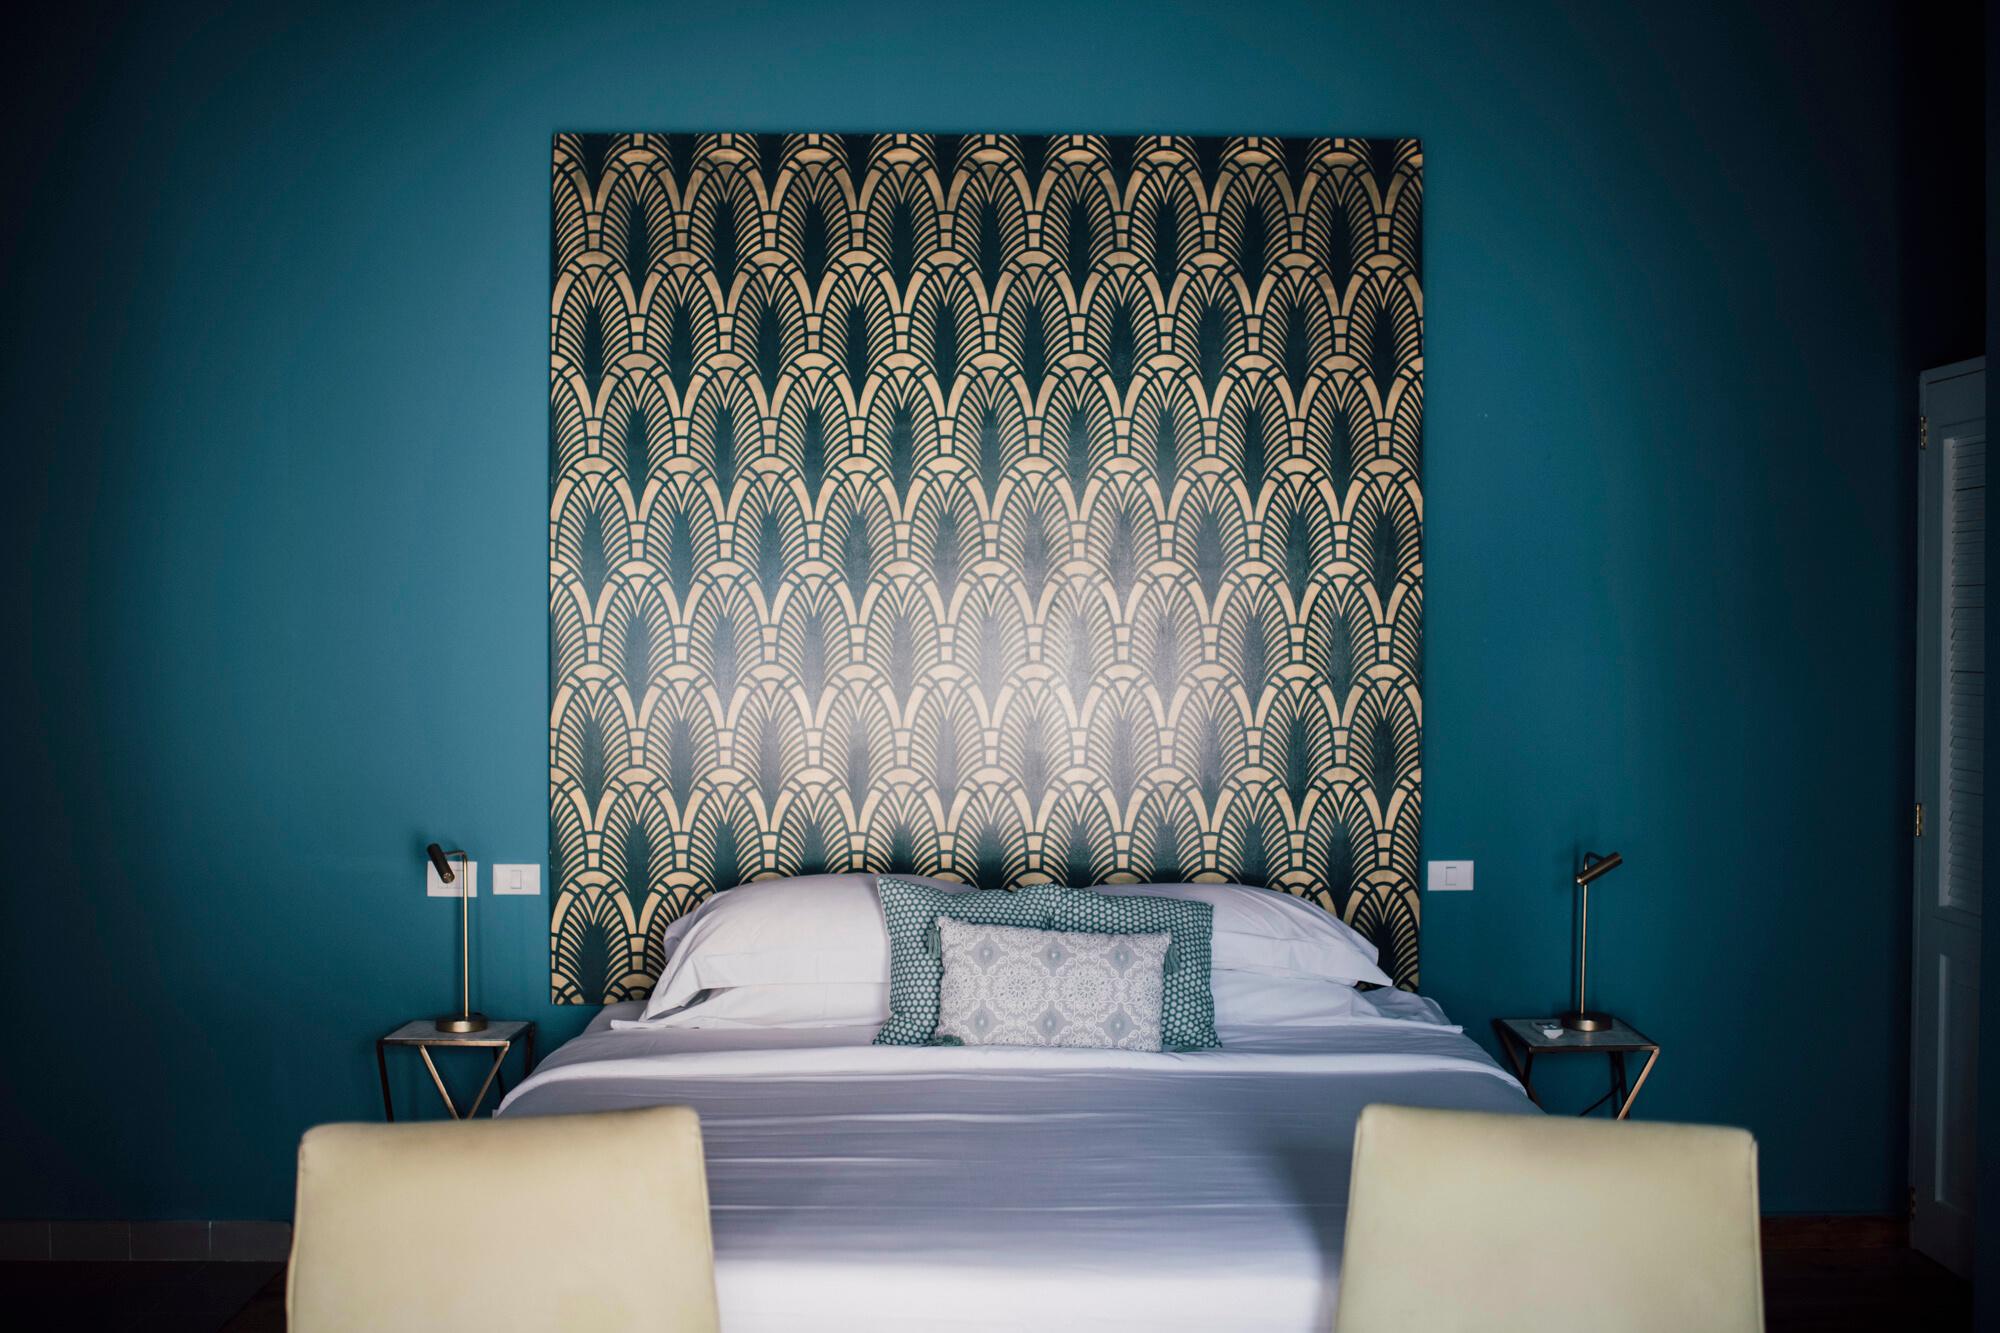 cuba_travel_exclusive_accommodations_bedroom.jpg